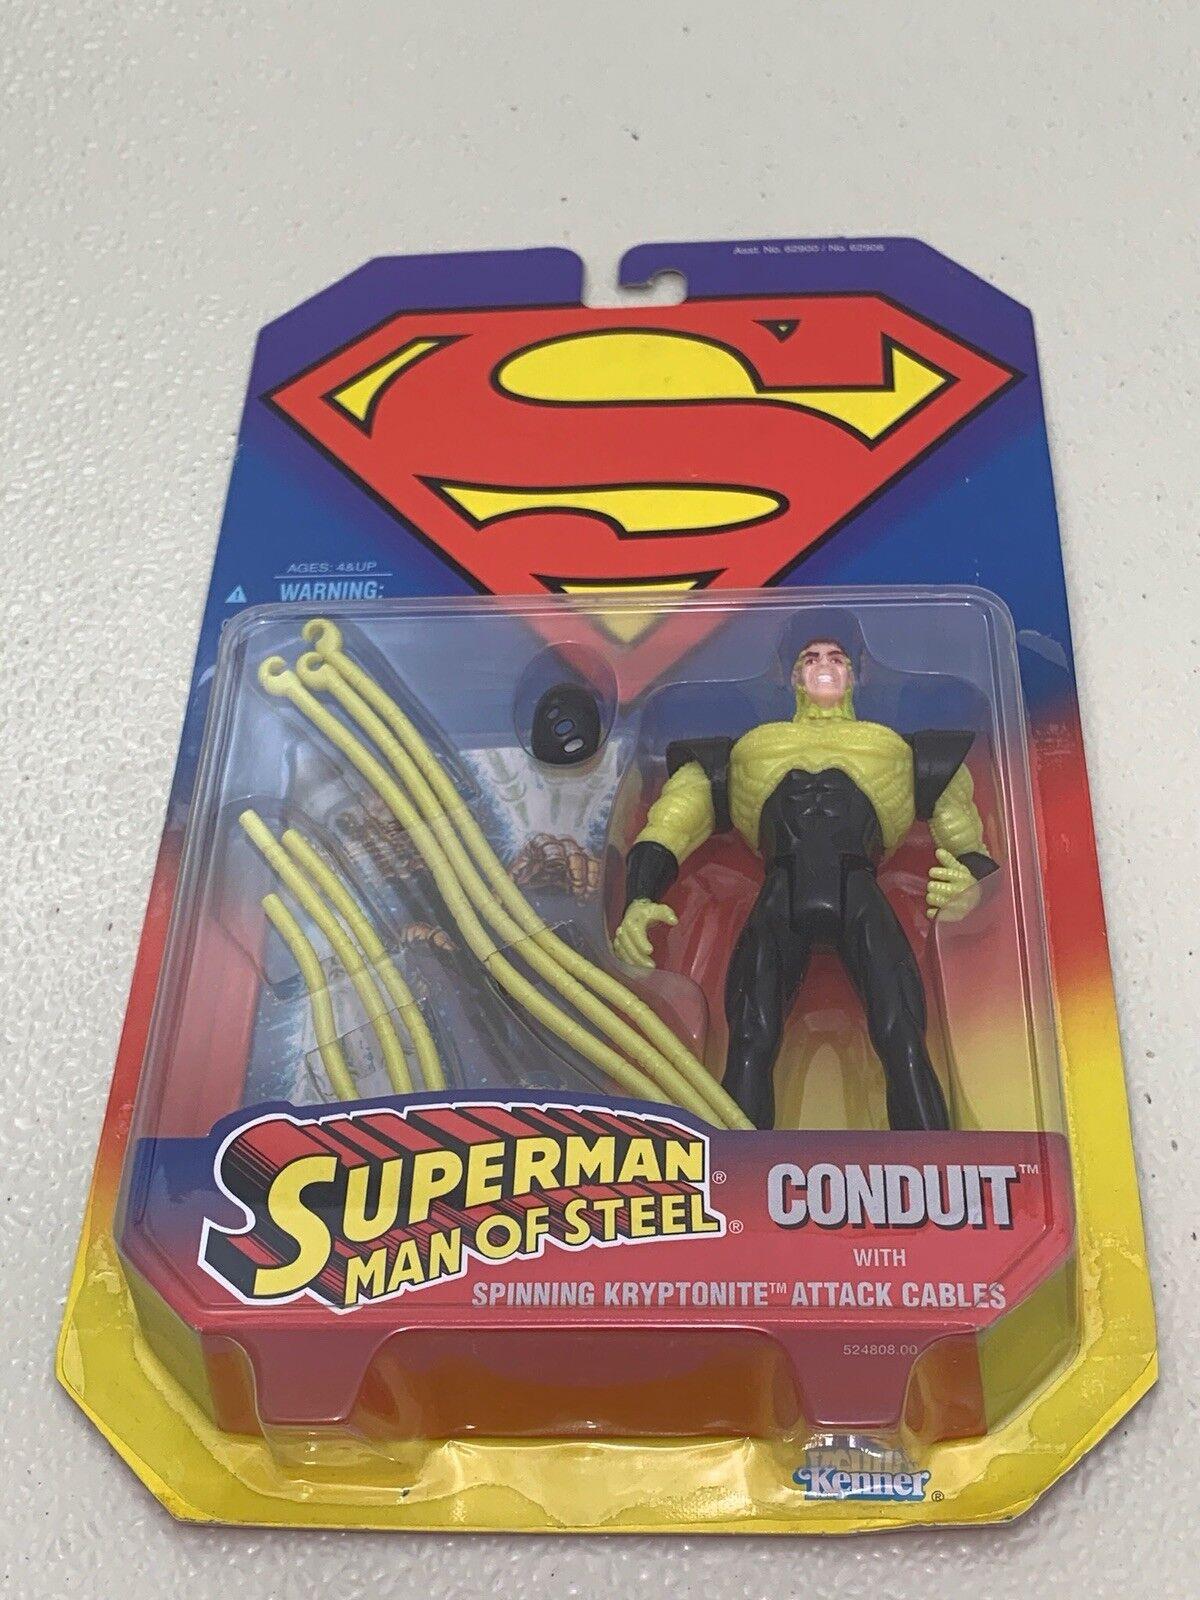 Superuomo uomo uomo uomo of Steel Conduit KENNER STeARD verde Tag Sample 24bab9